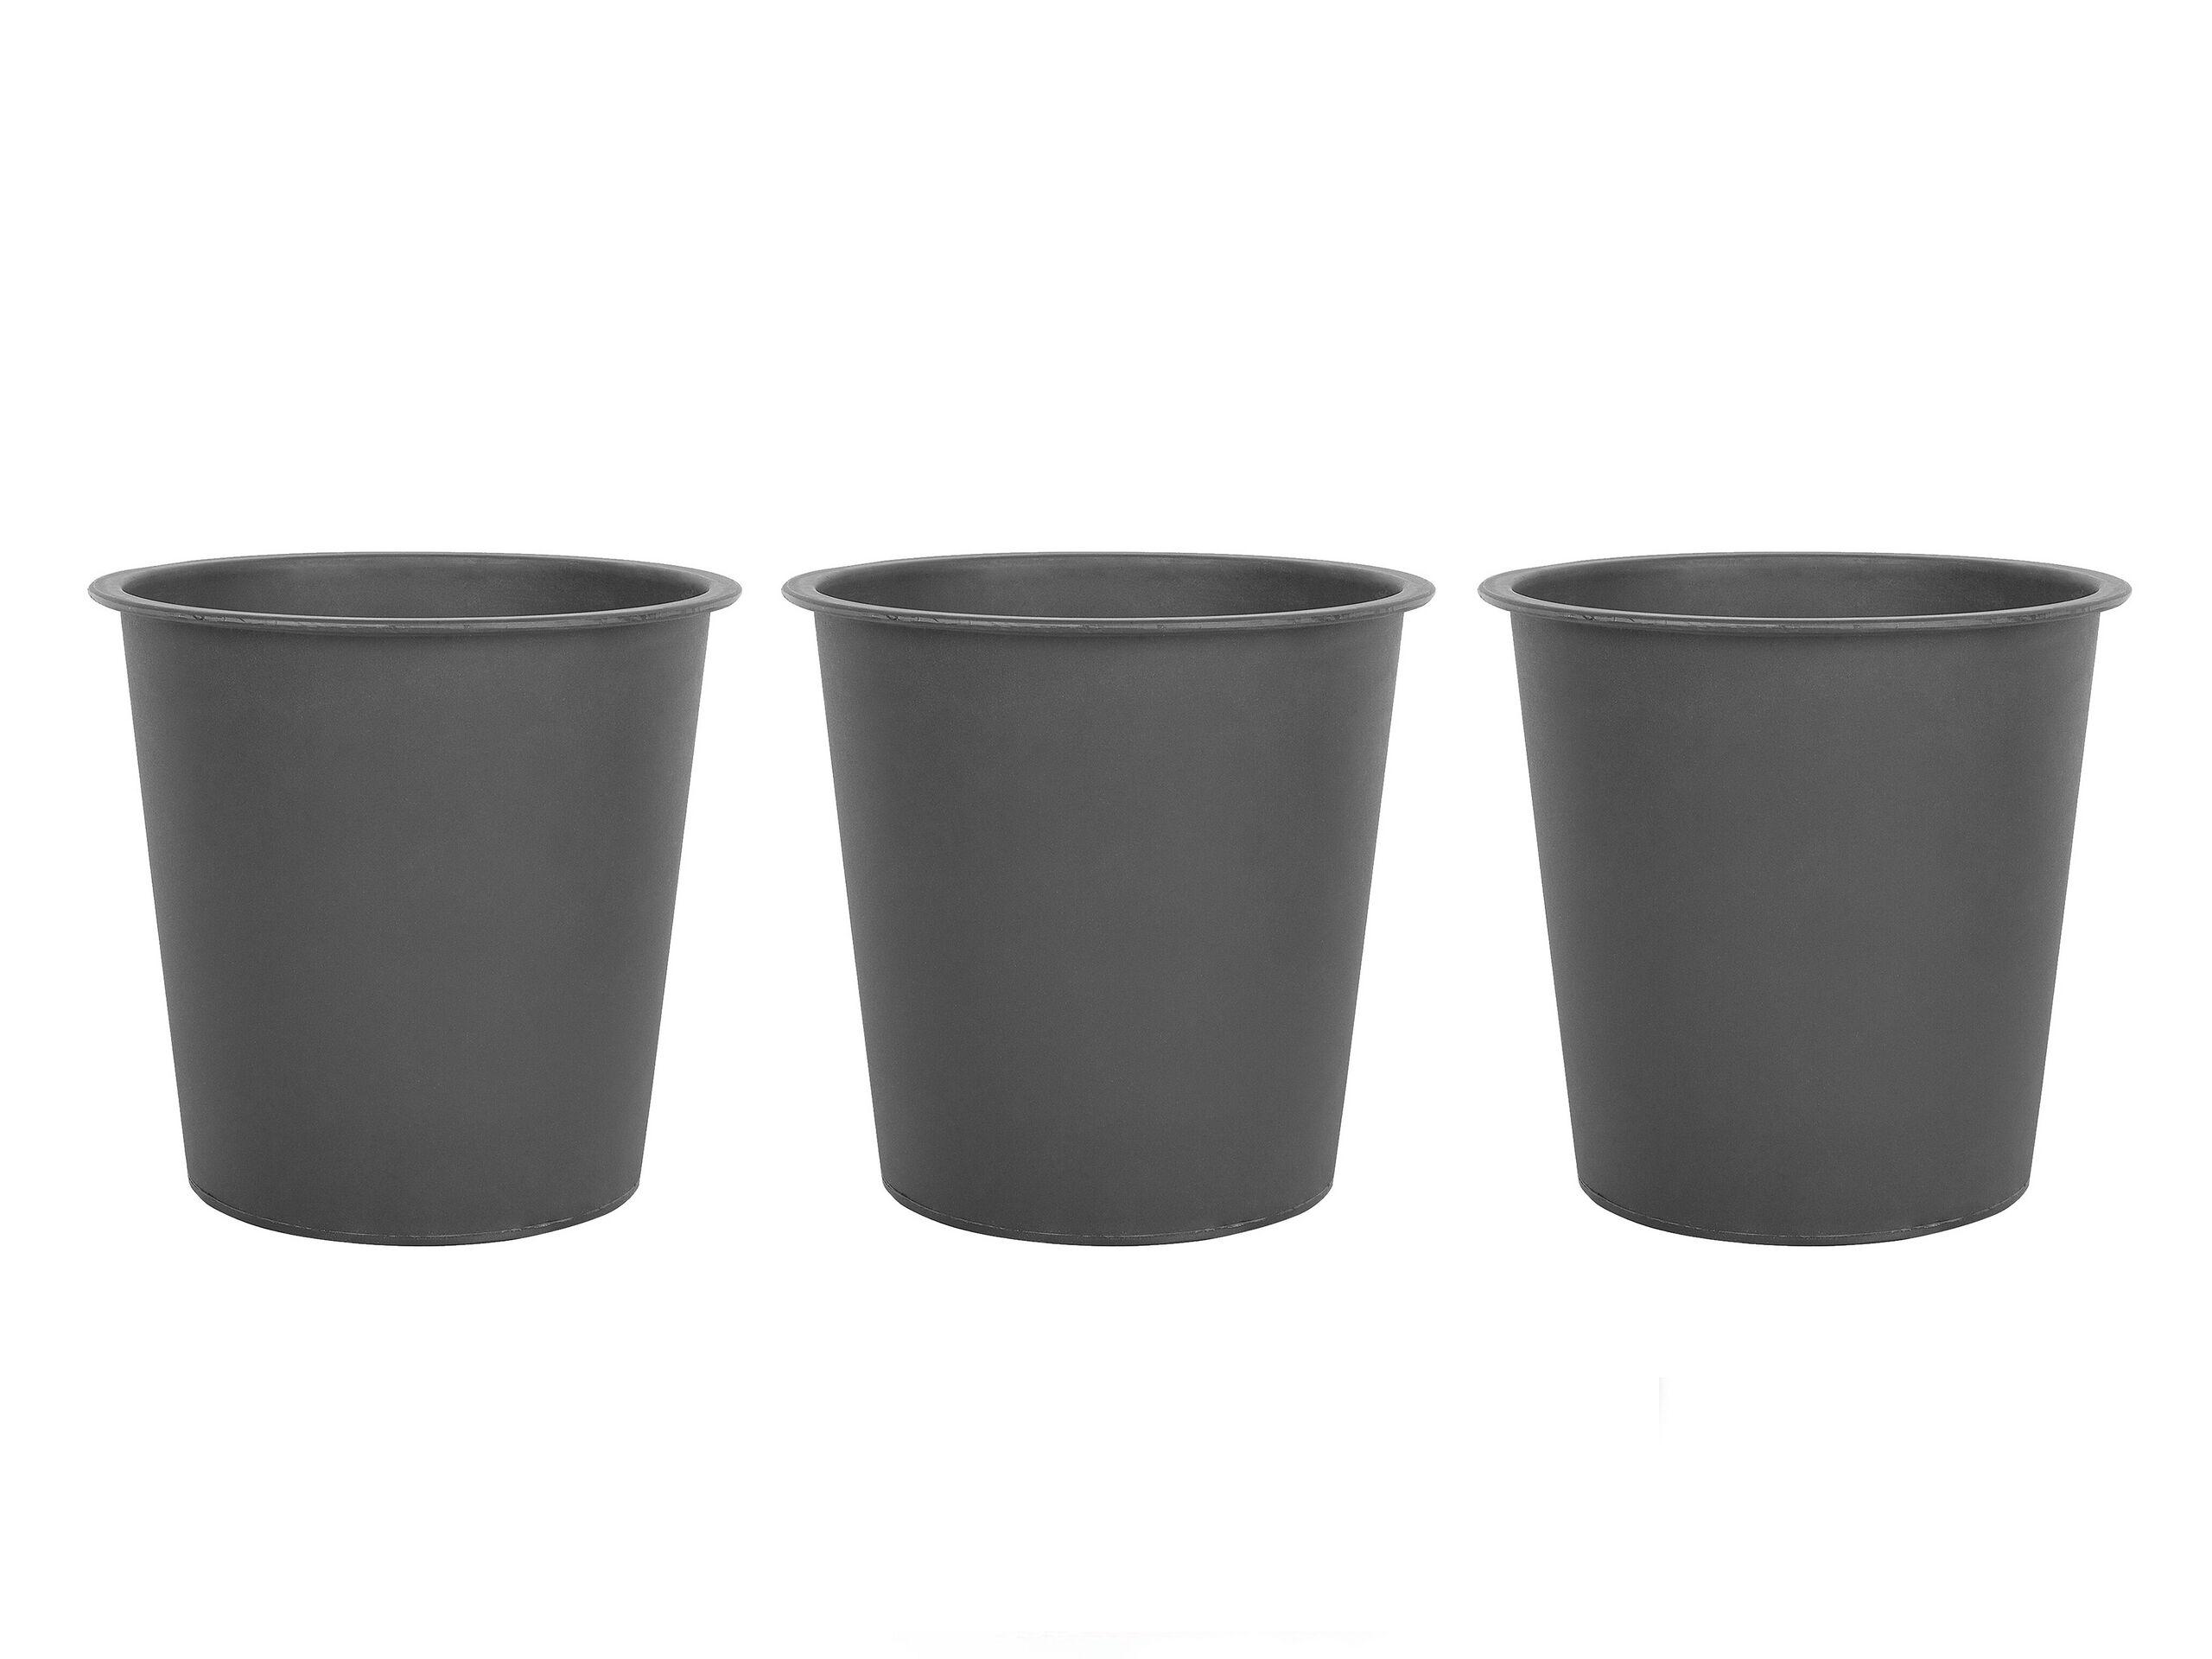 beliani set 3 inserti di plastica nera rotondi per vasi da fiori ⌀ 26 cm